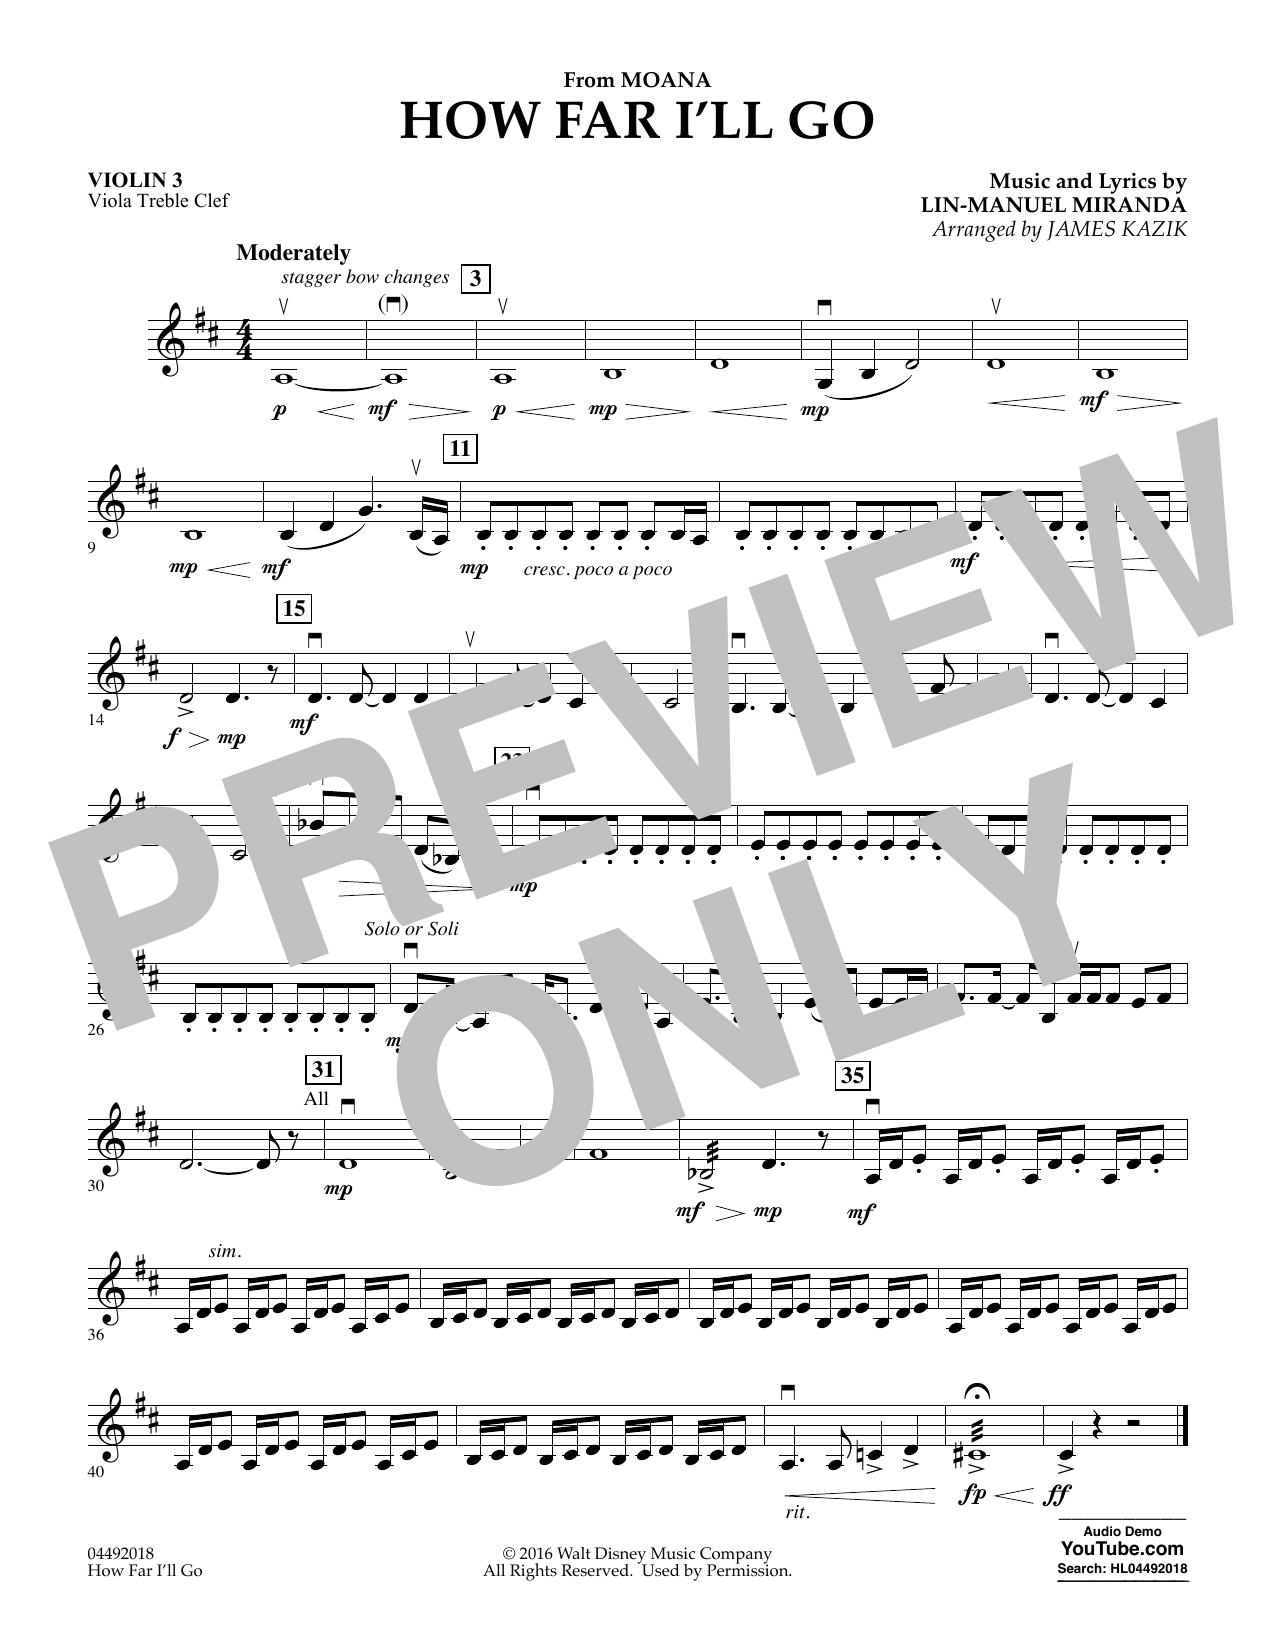 James Kazik How Far I'll Go (from Moana) - Violin 3 (Viola Treble Clef) sheet music notes and chords. Download Printable PDF.